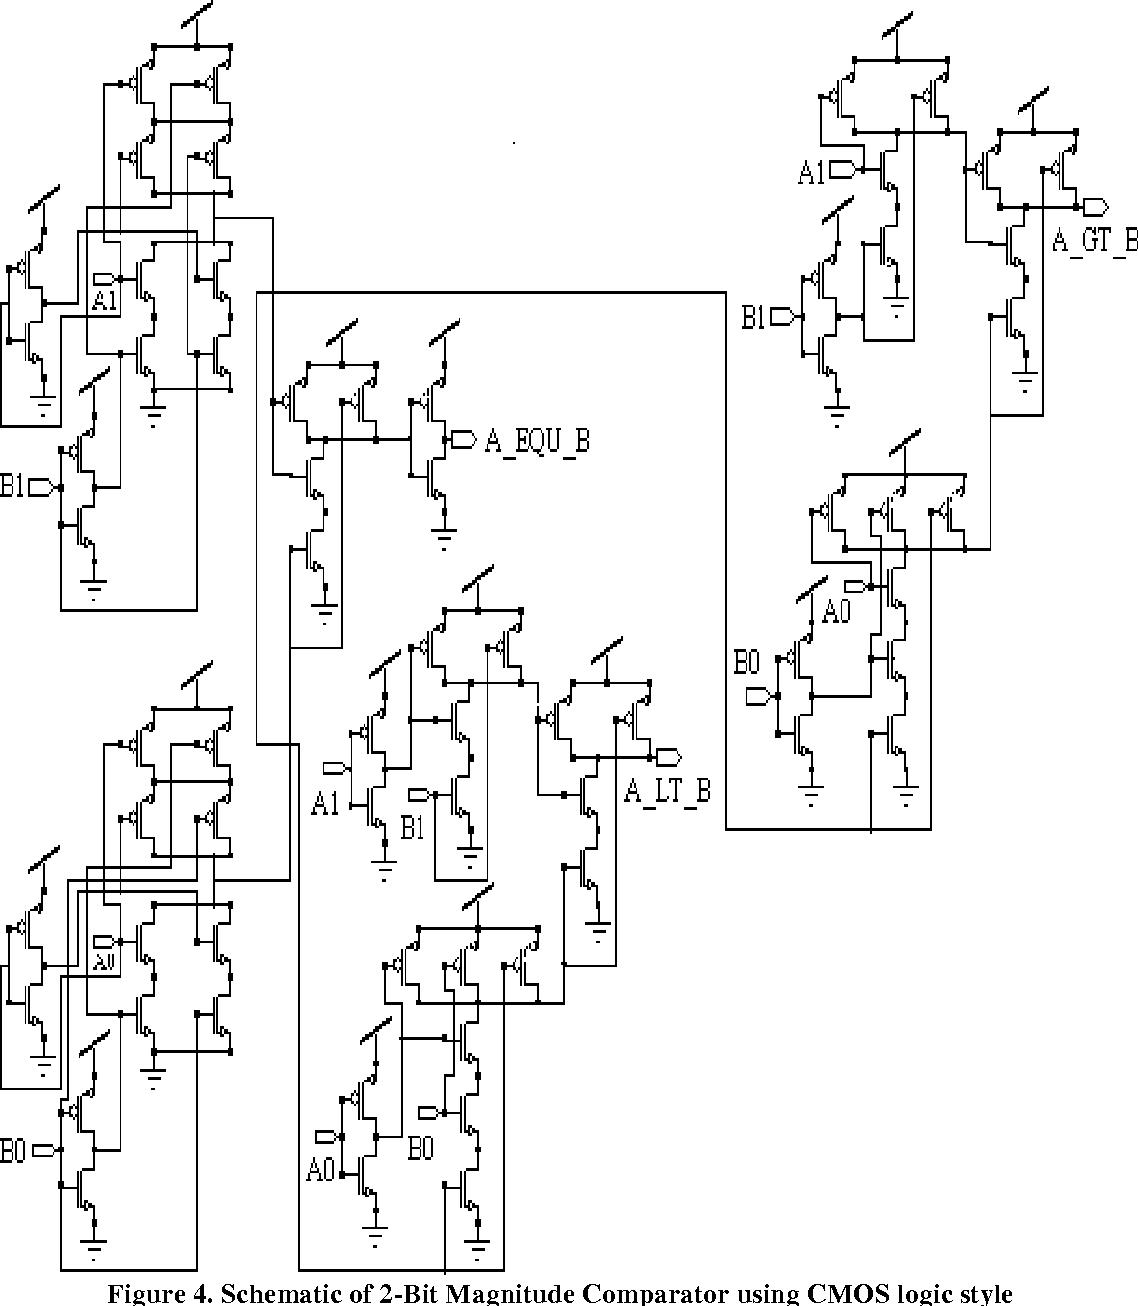 PDF] 2-Bit Magnitude Comparator Design Using Different Logic Styles on